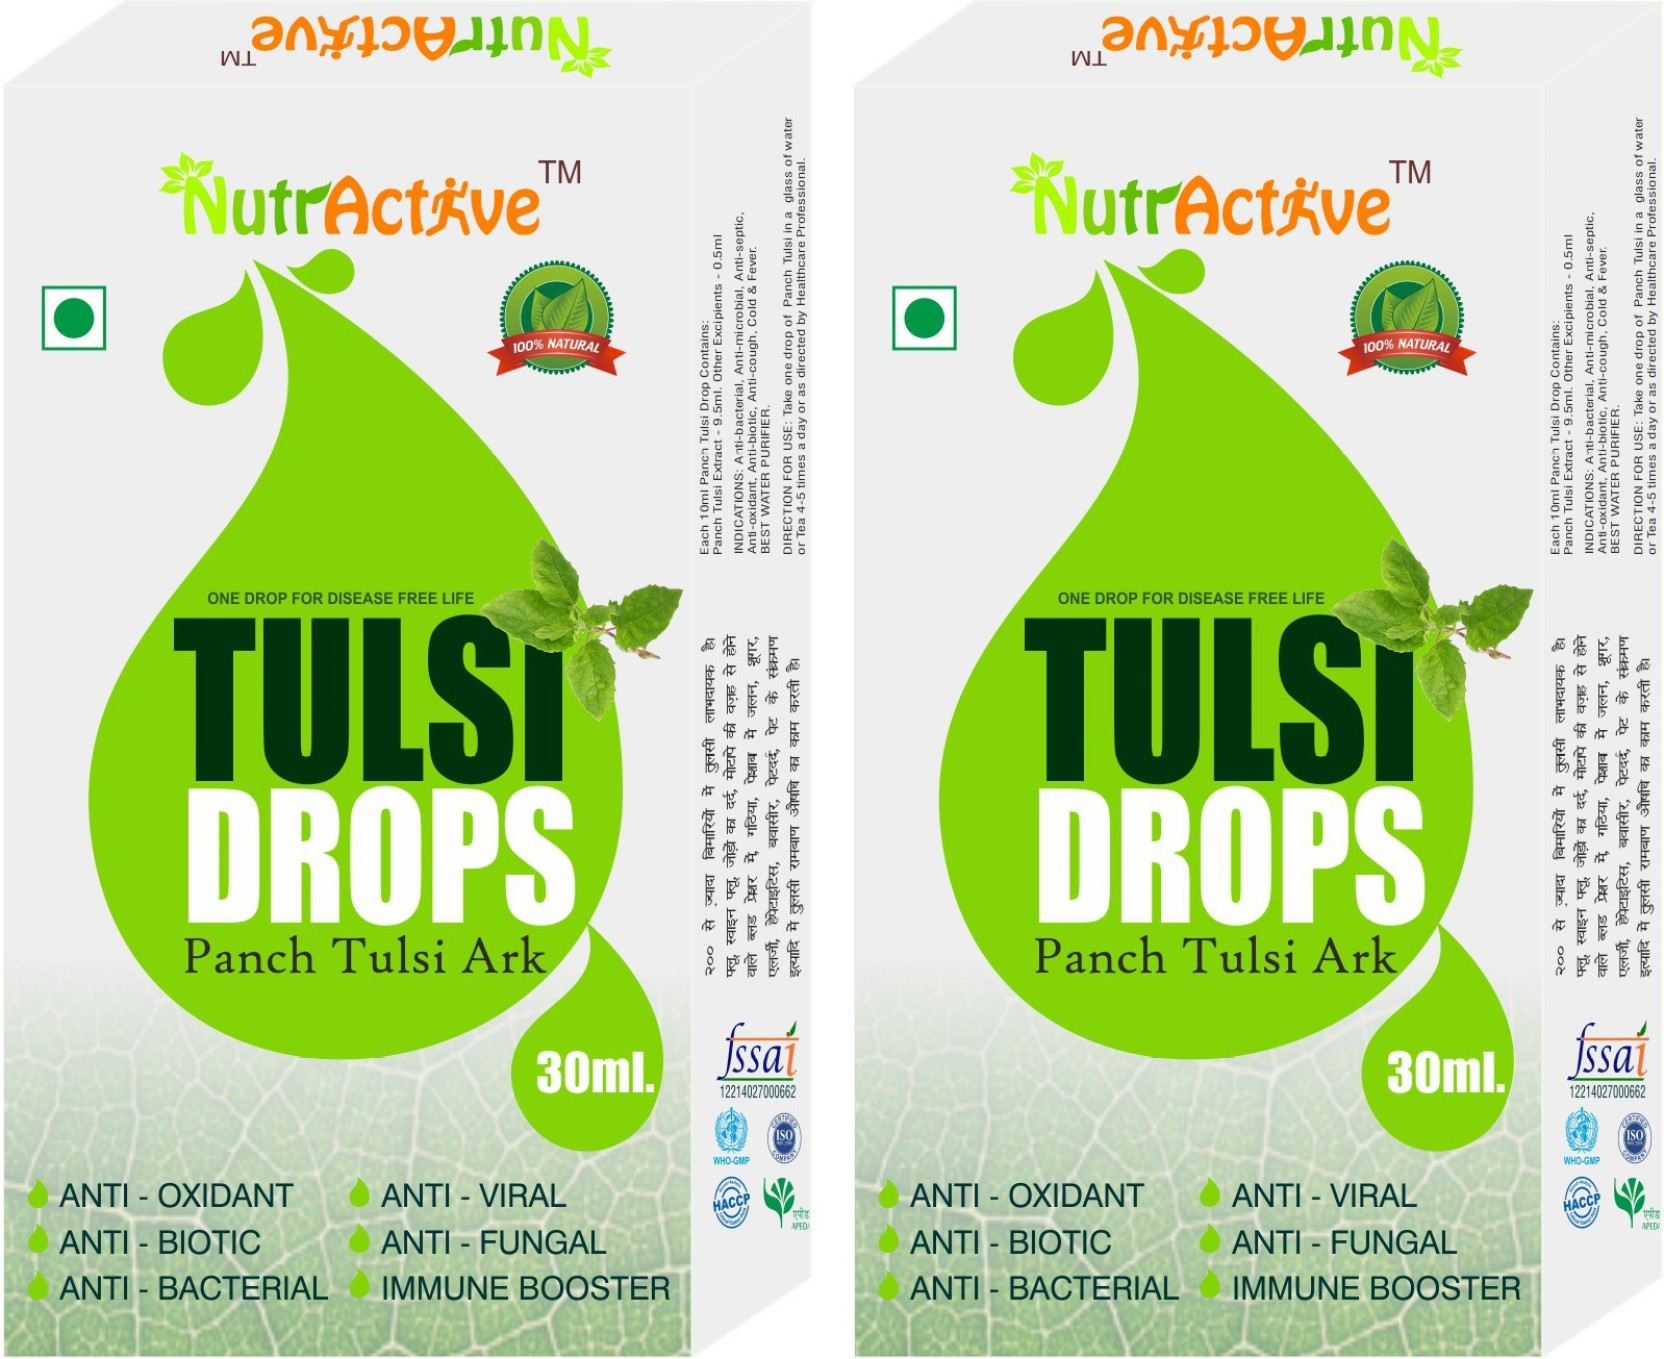 NutrActive Tulsi Drops (Panch Tulsi Ark) - 60ml   Natural